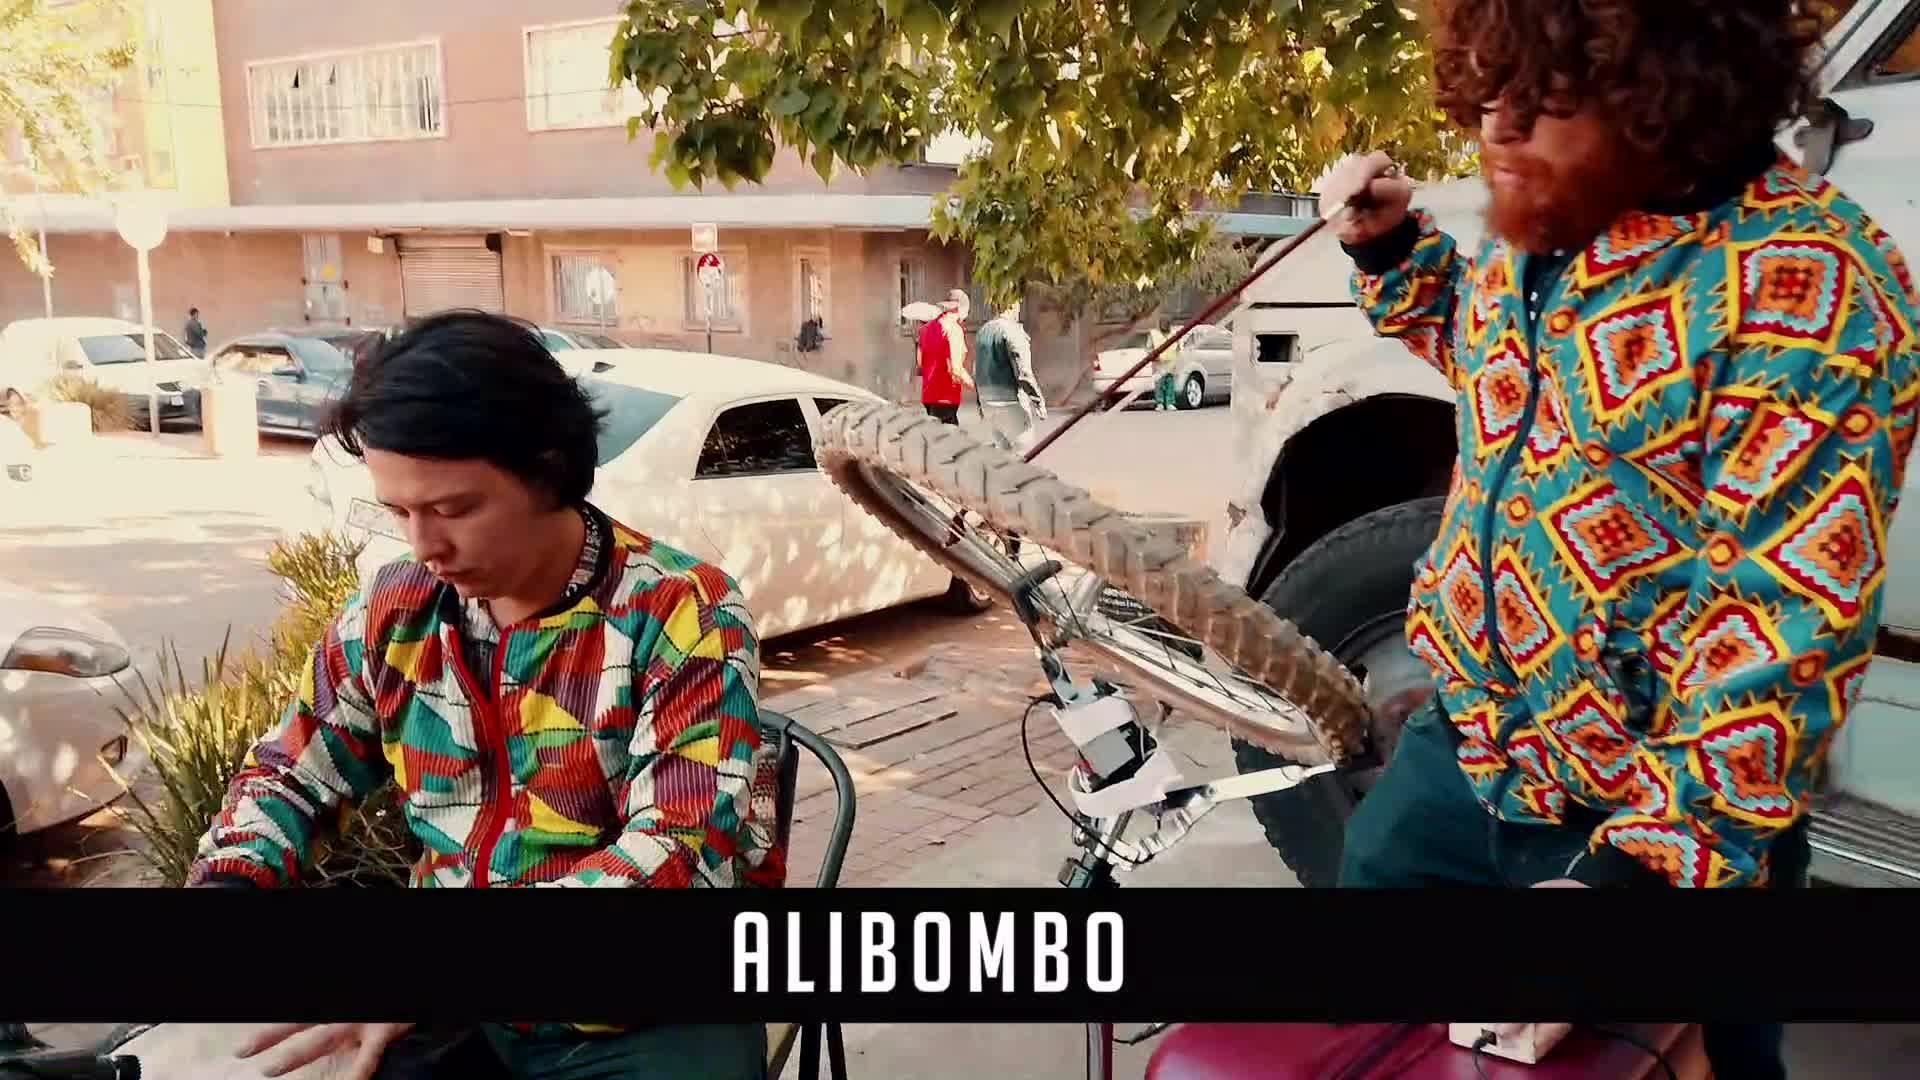 Urban Rootops 011 - Alibombo